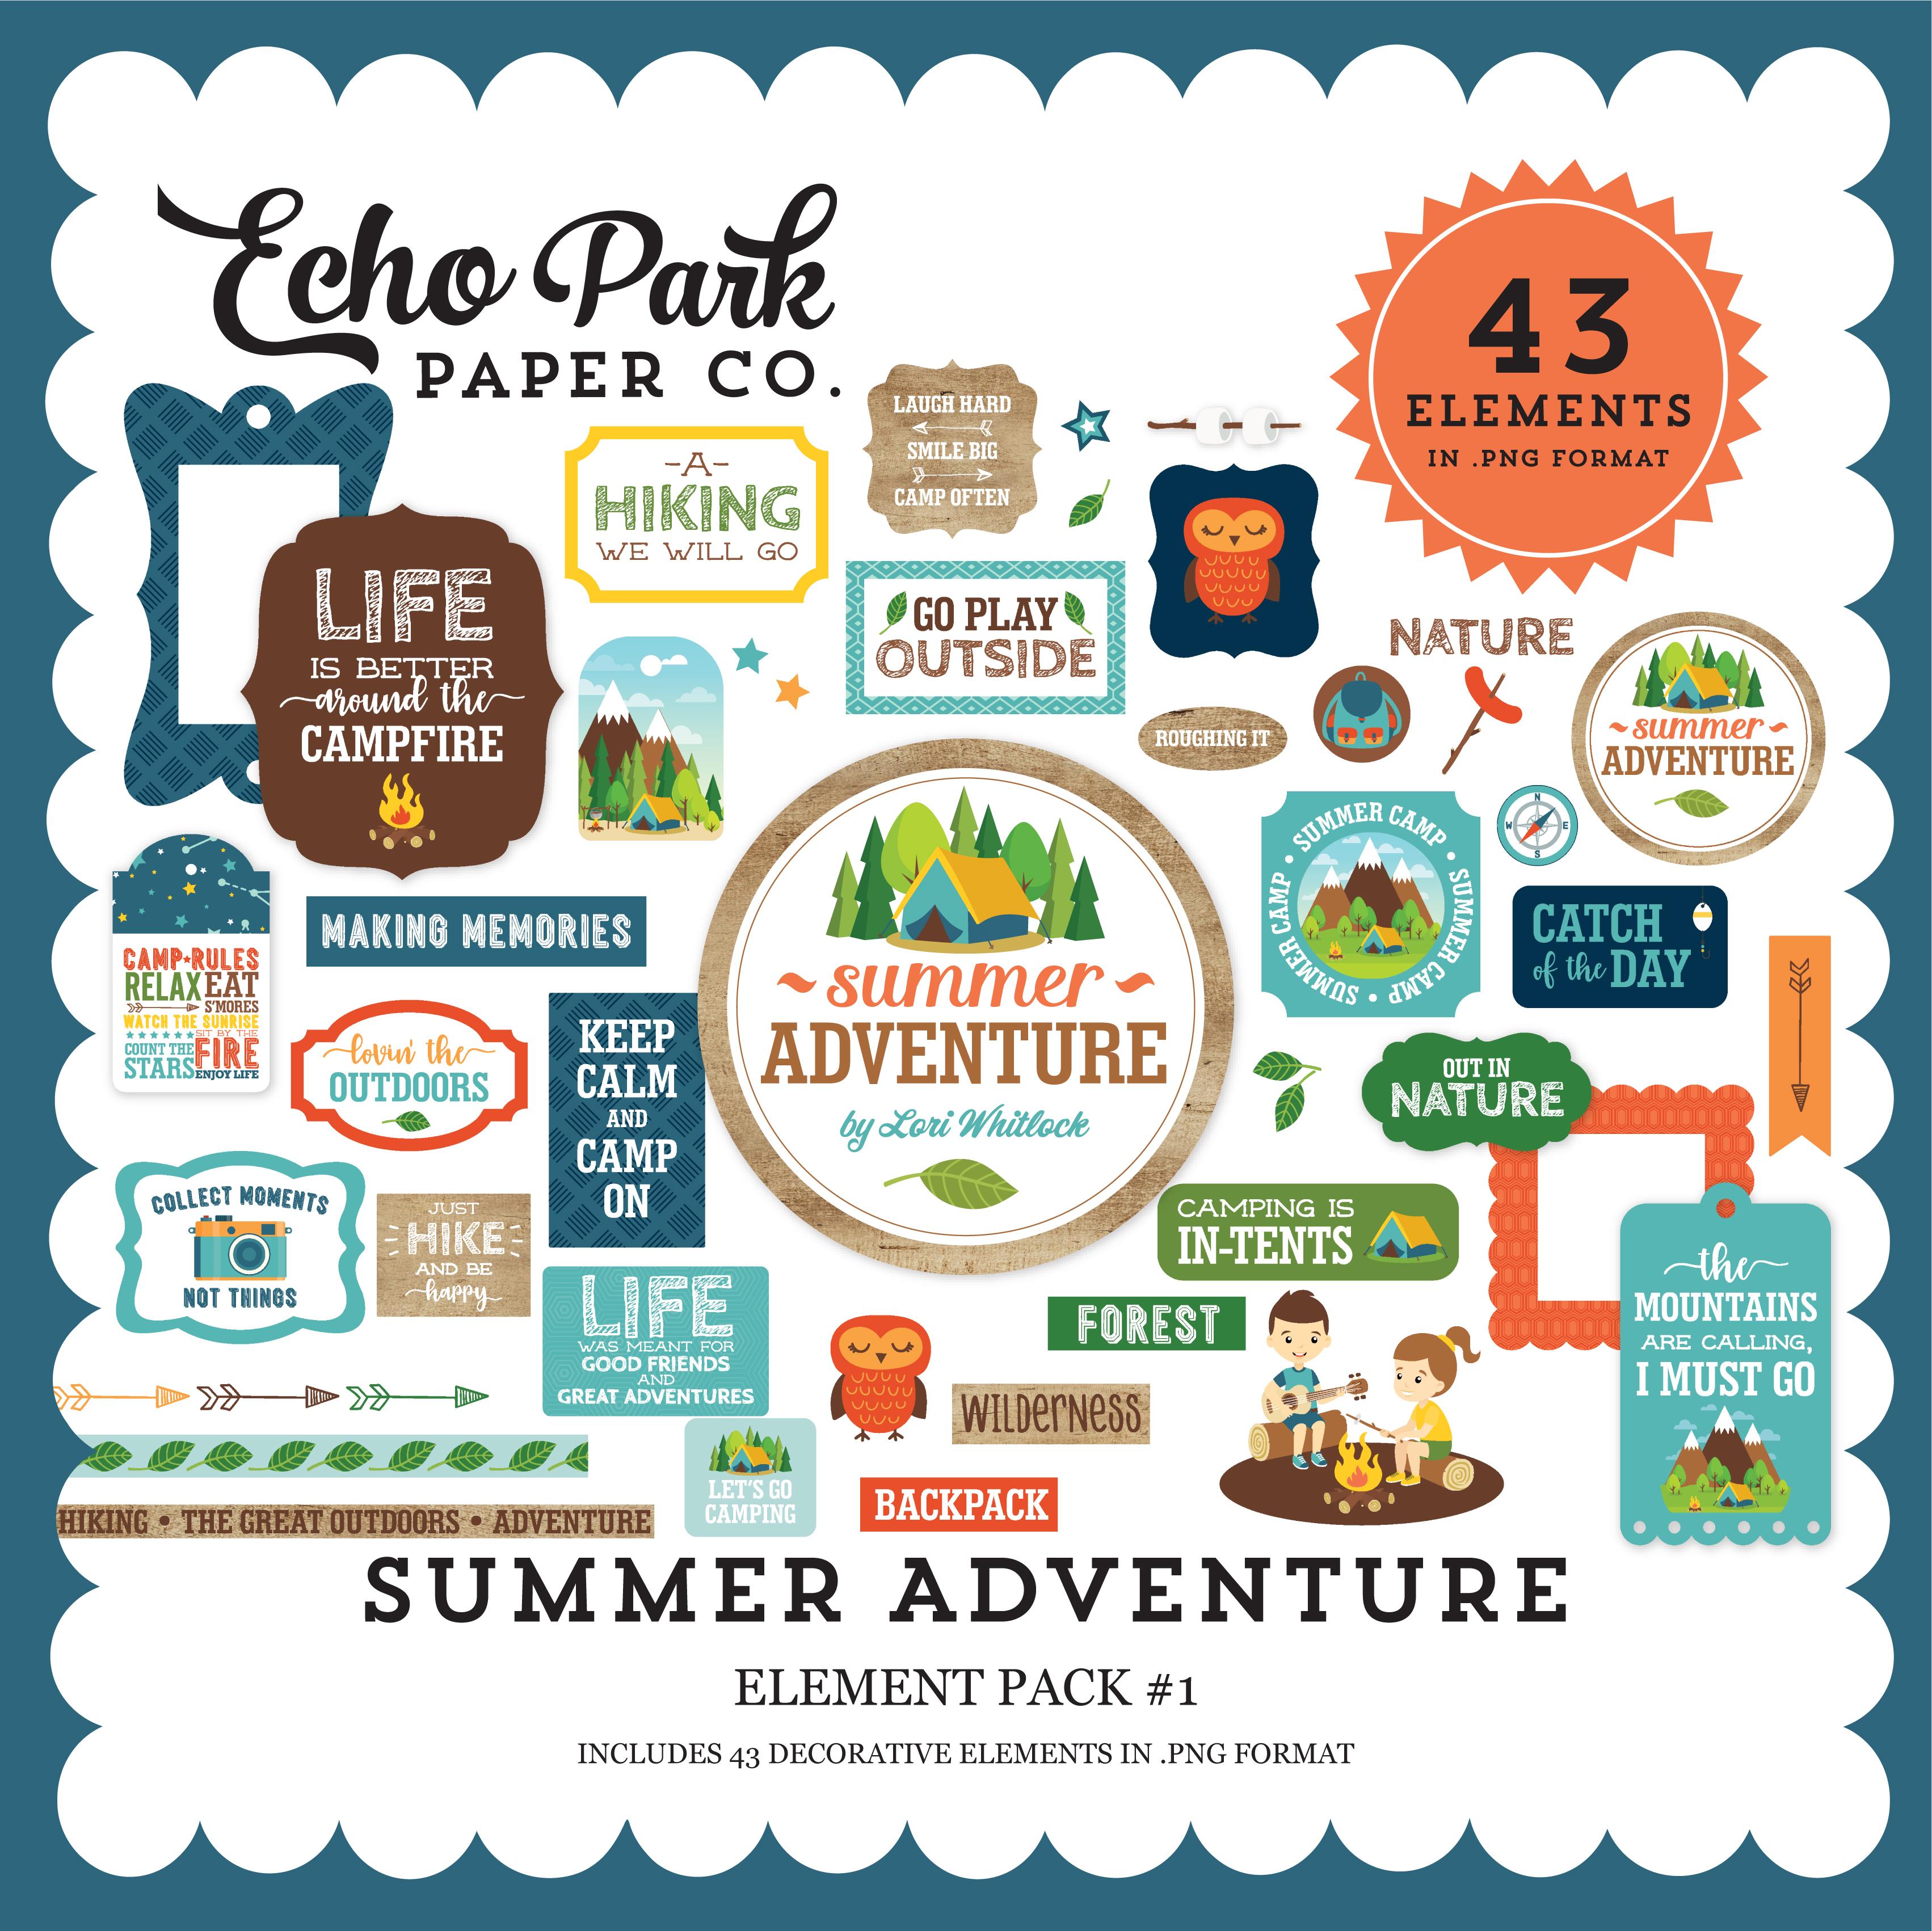 Summer Adventure Element Pack #1